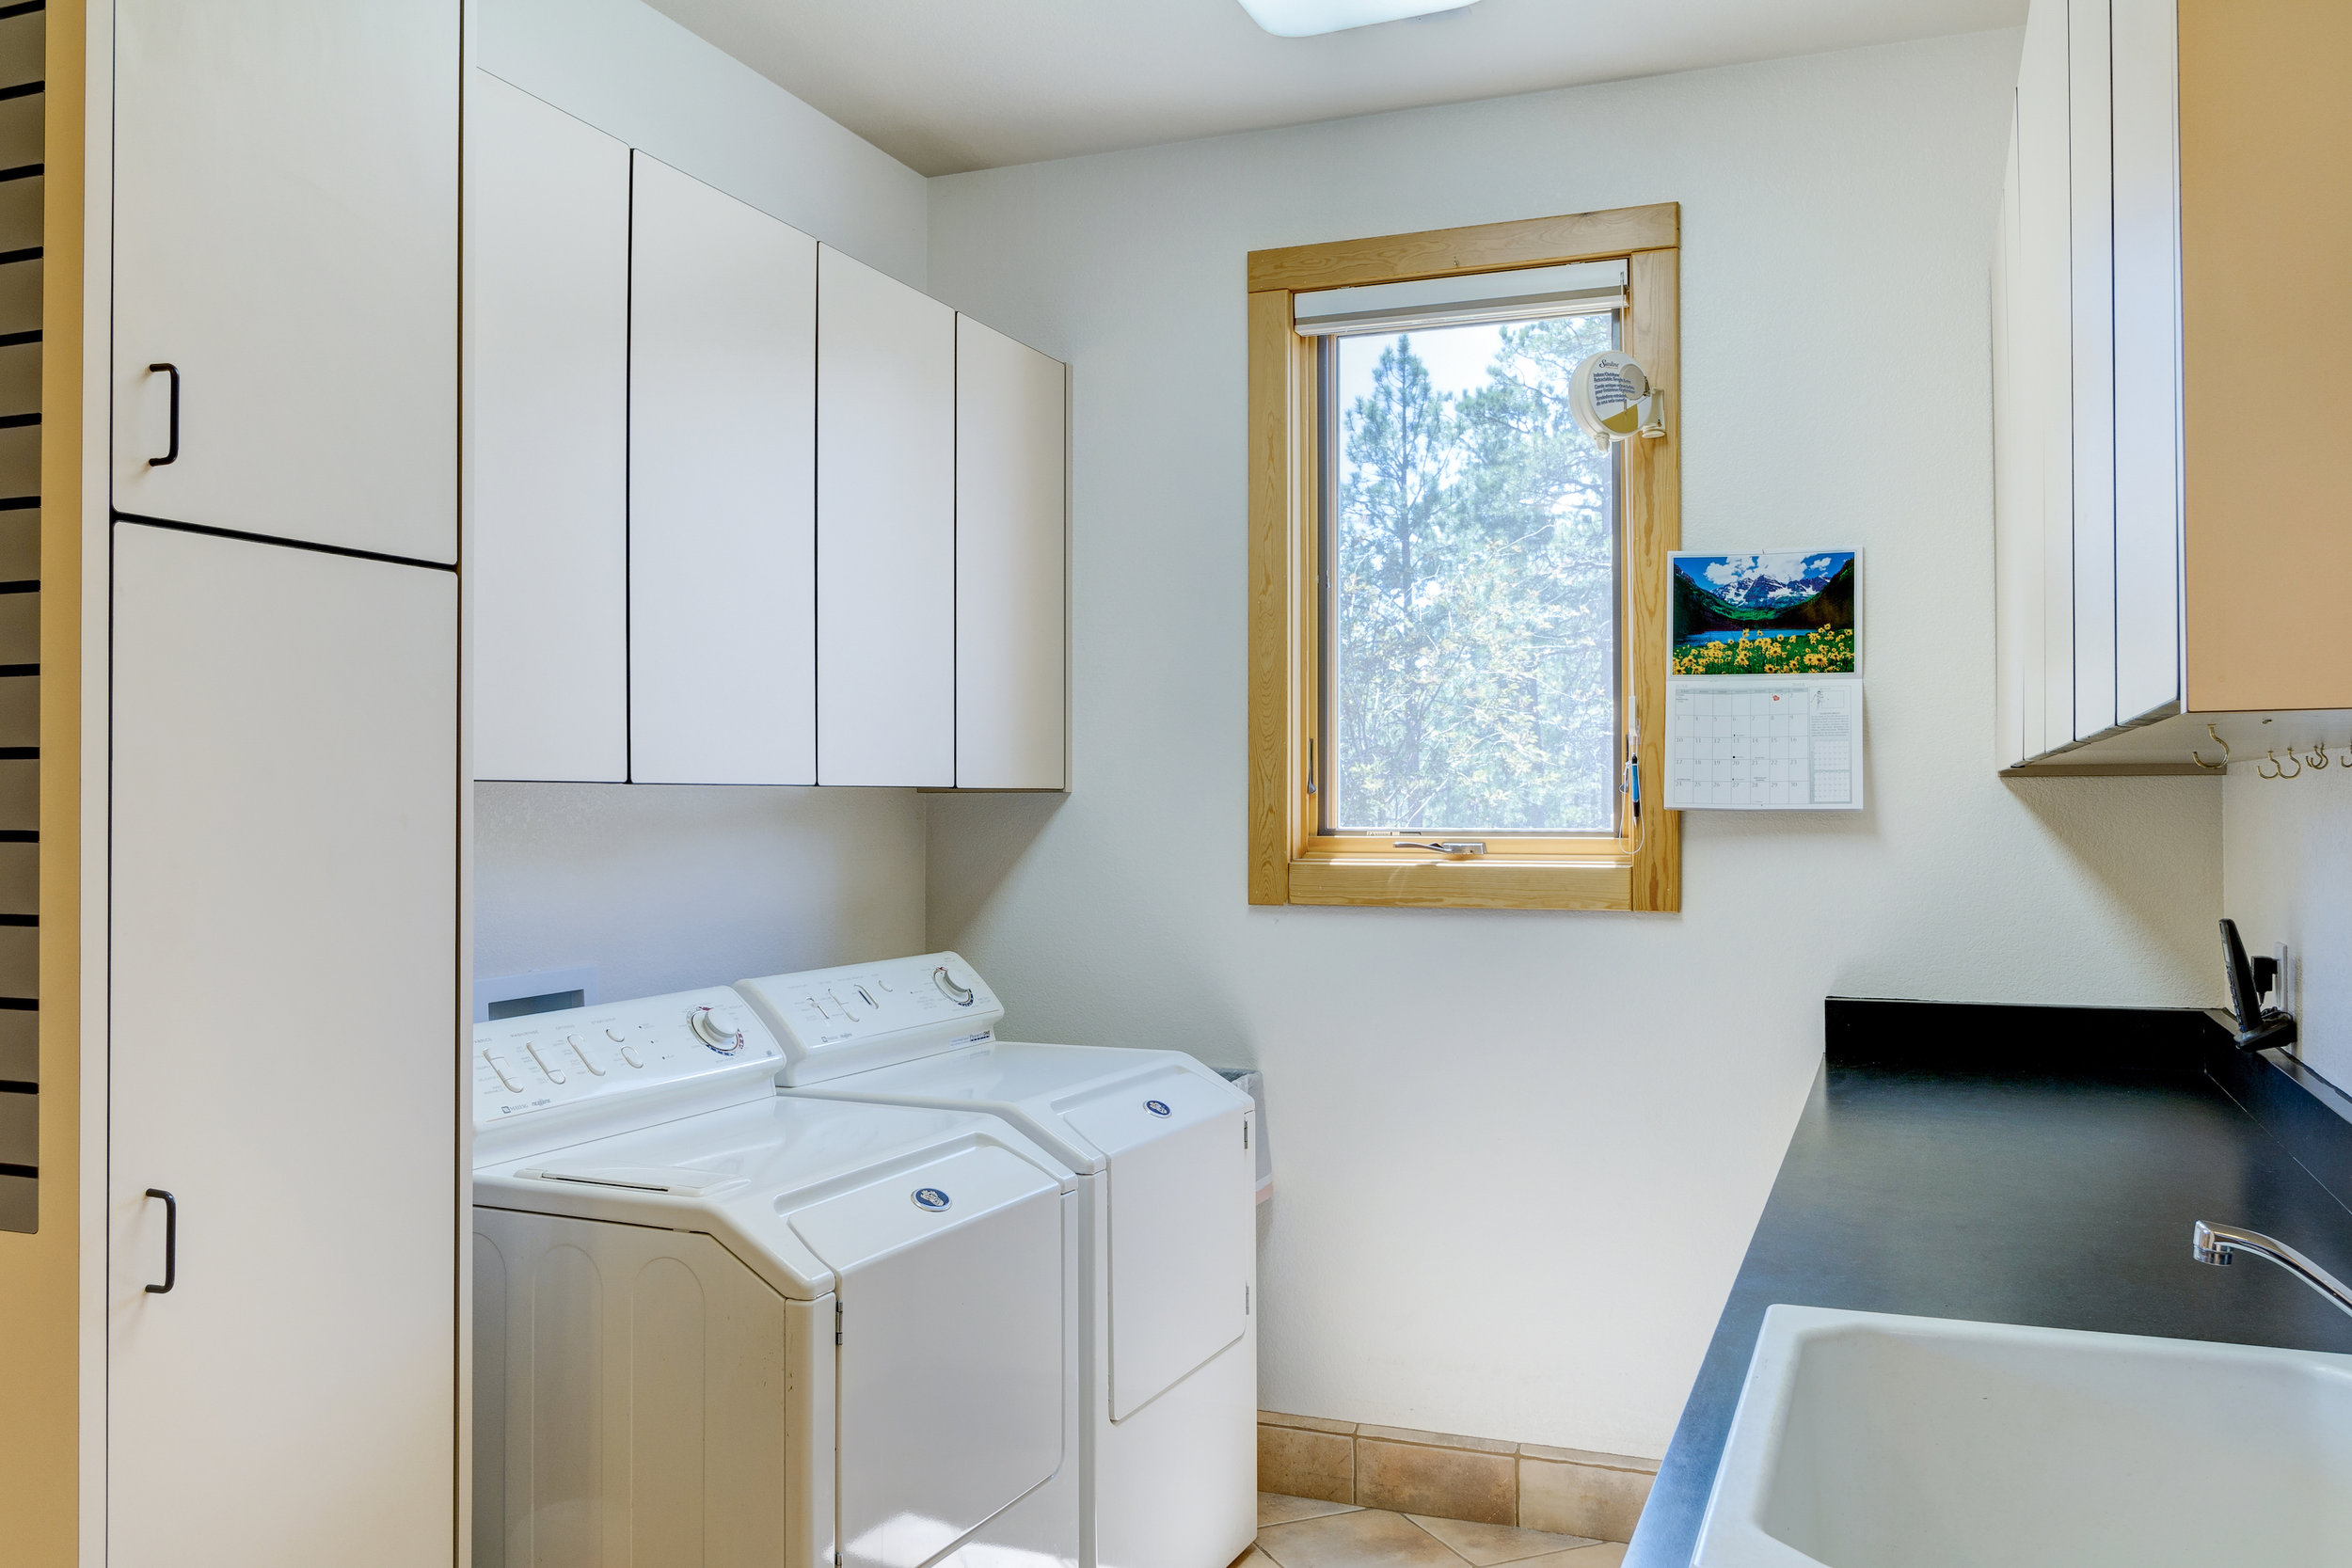 22-Laundry Room.jpg